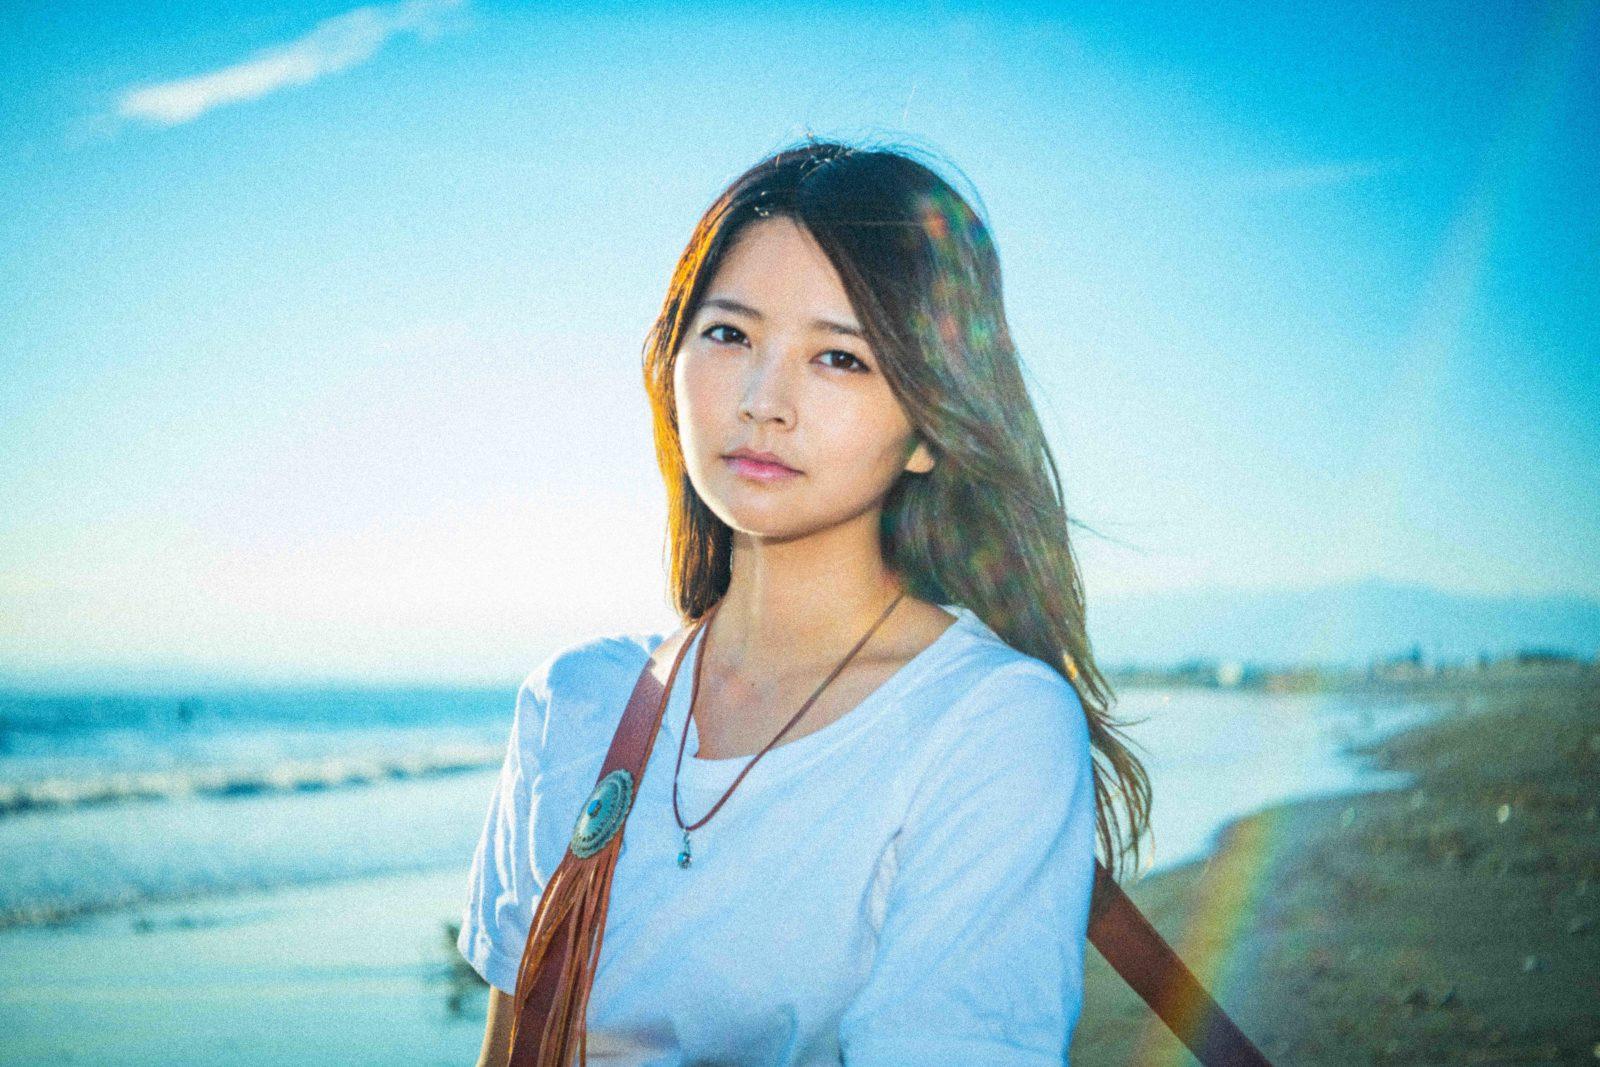 Miyuu、新曲「Restart」が渋江譲二×大野いとW主演映画 『新卒ポモドーロ』主題歌に決定サムネイル画像